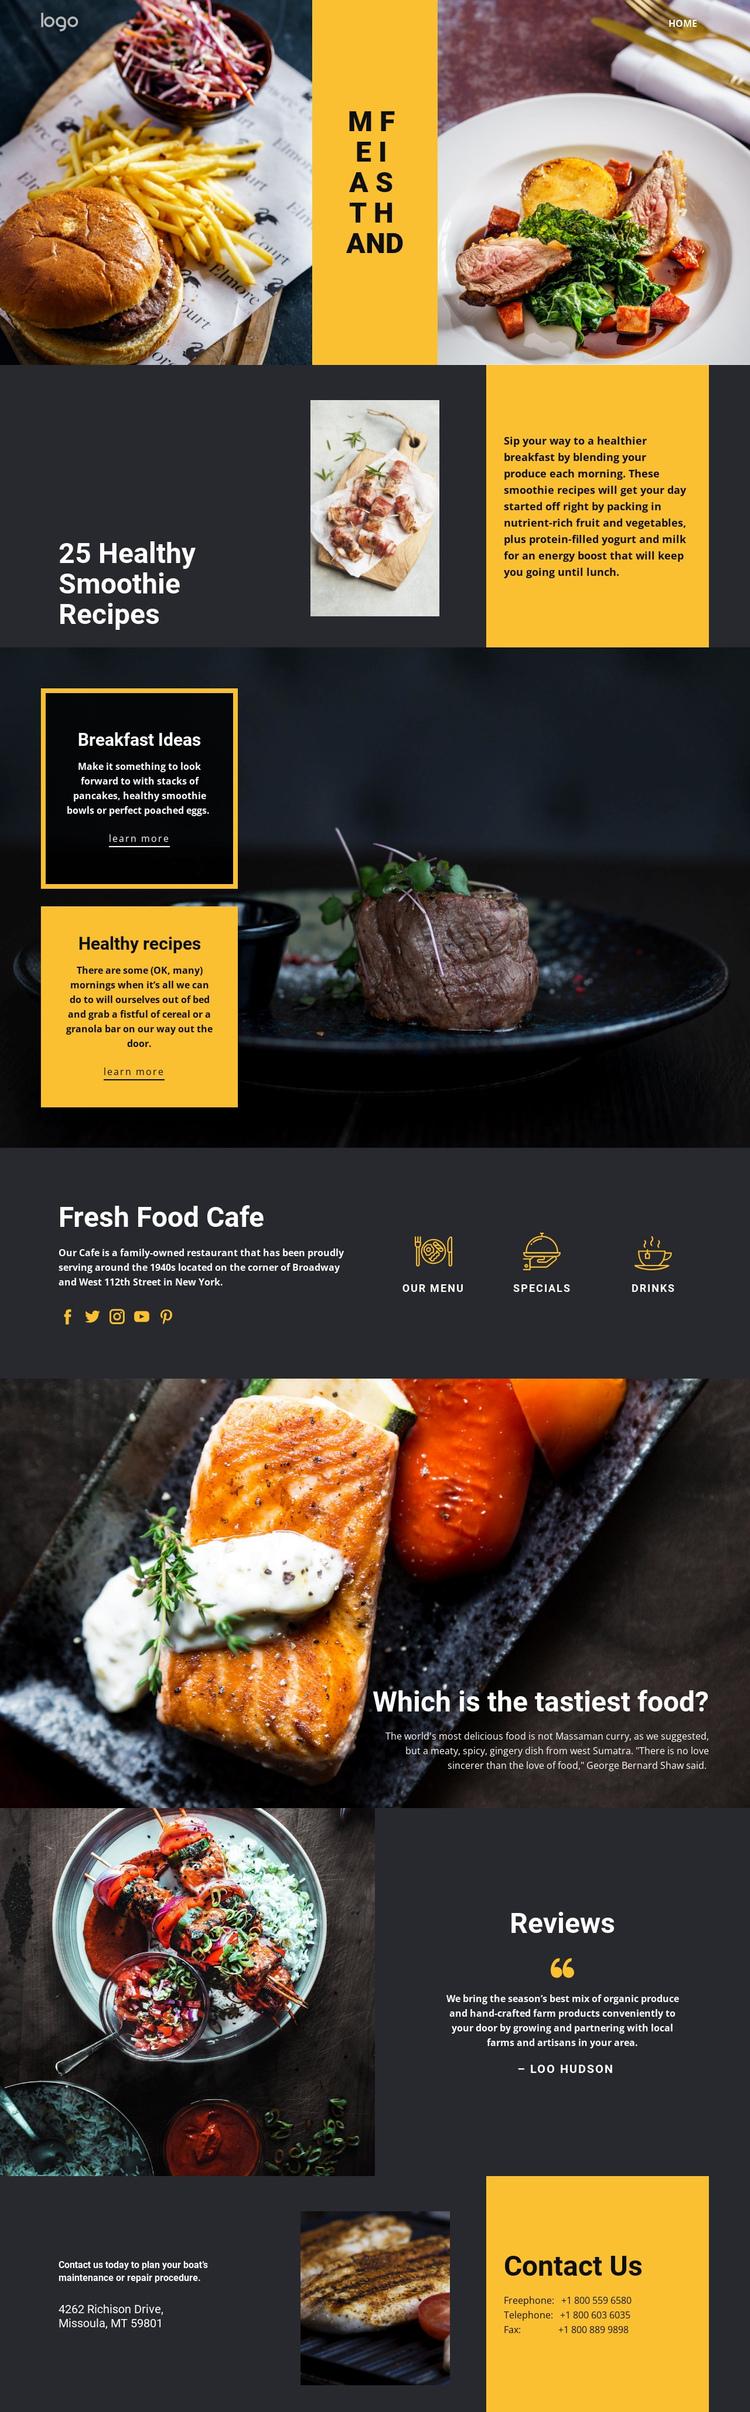 Good recipes for good food Website Builder Software